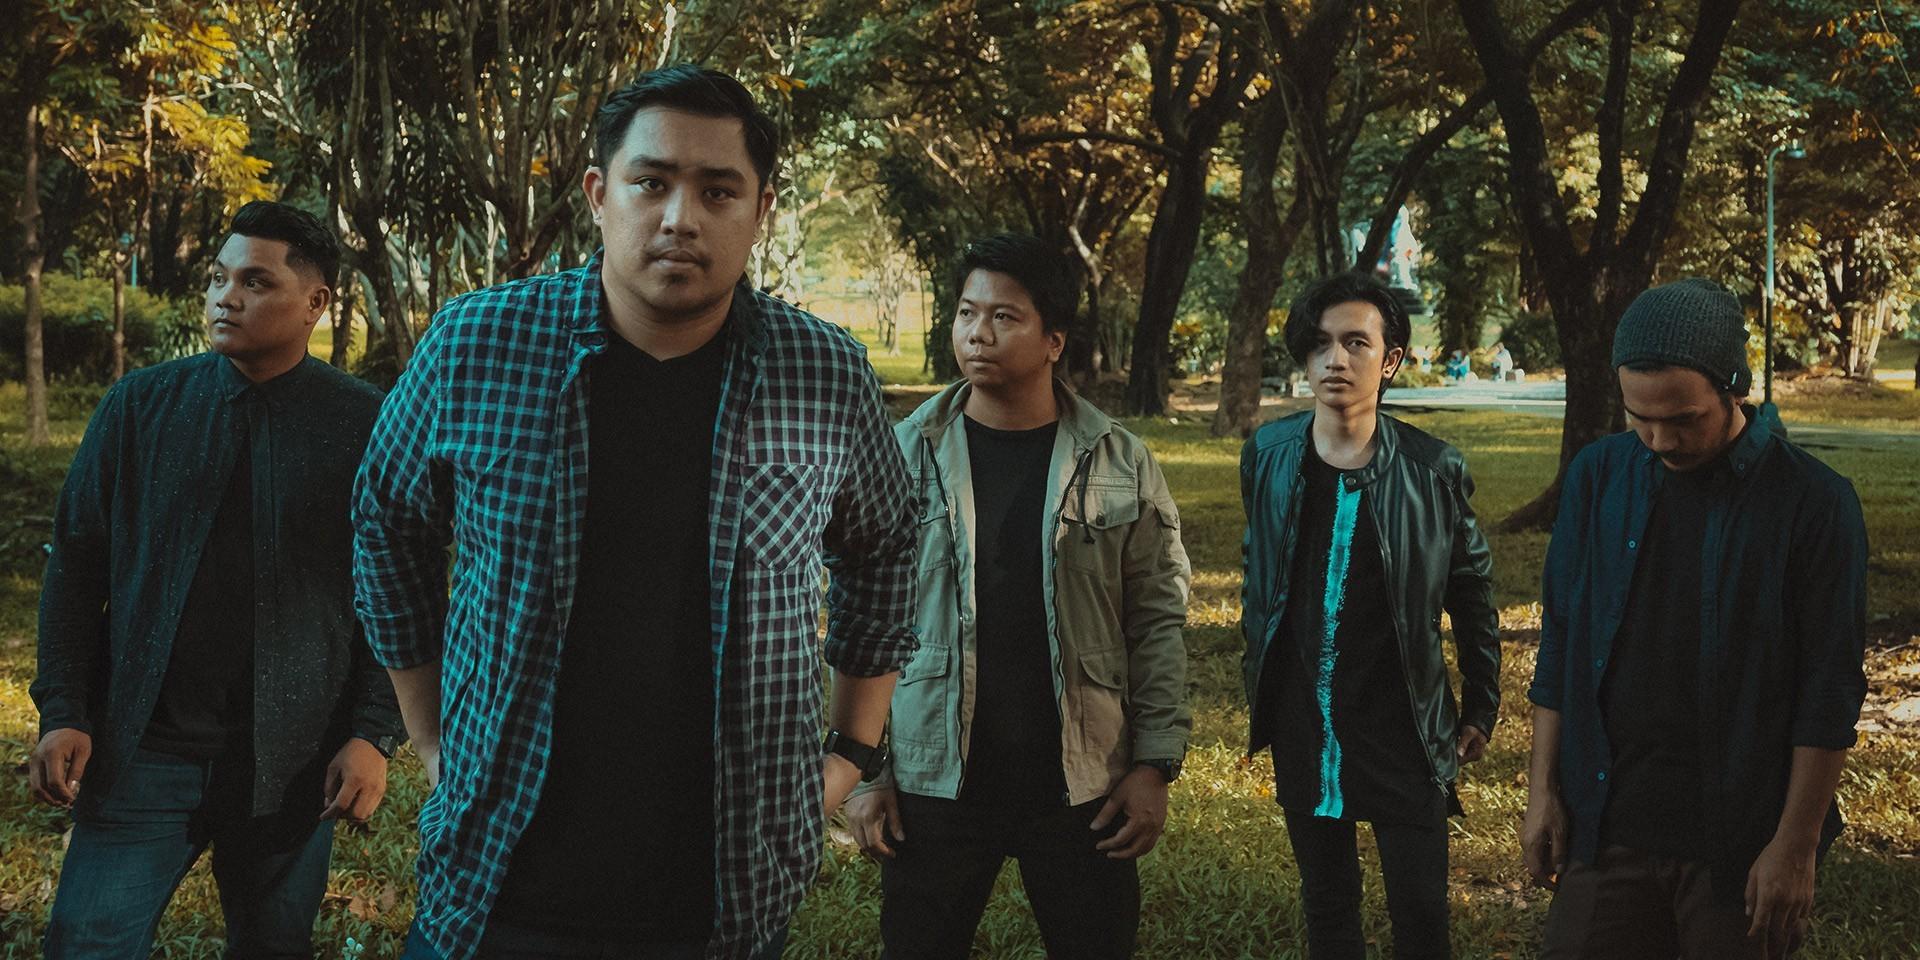 December Avenue open up about mental health awareness surrounding 'Bulong' video